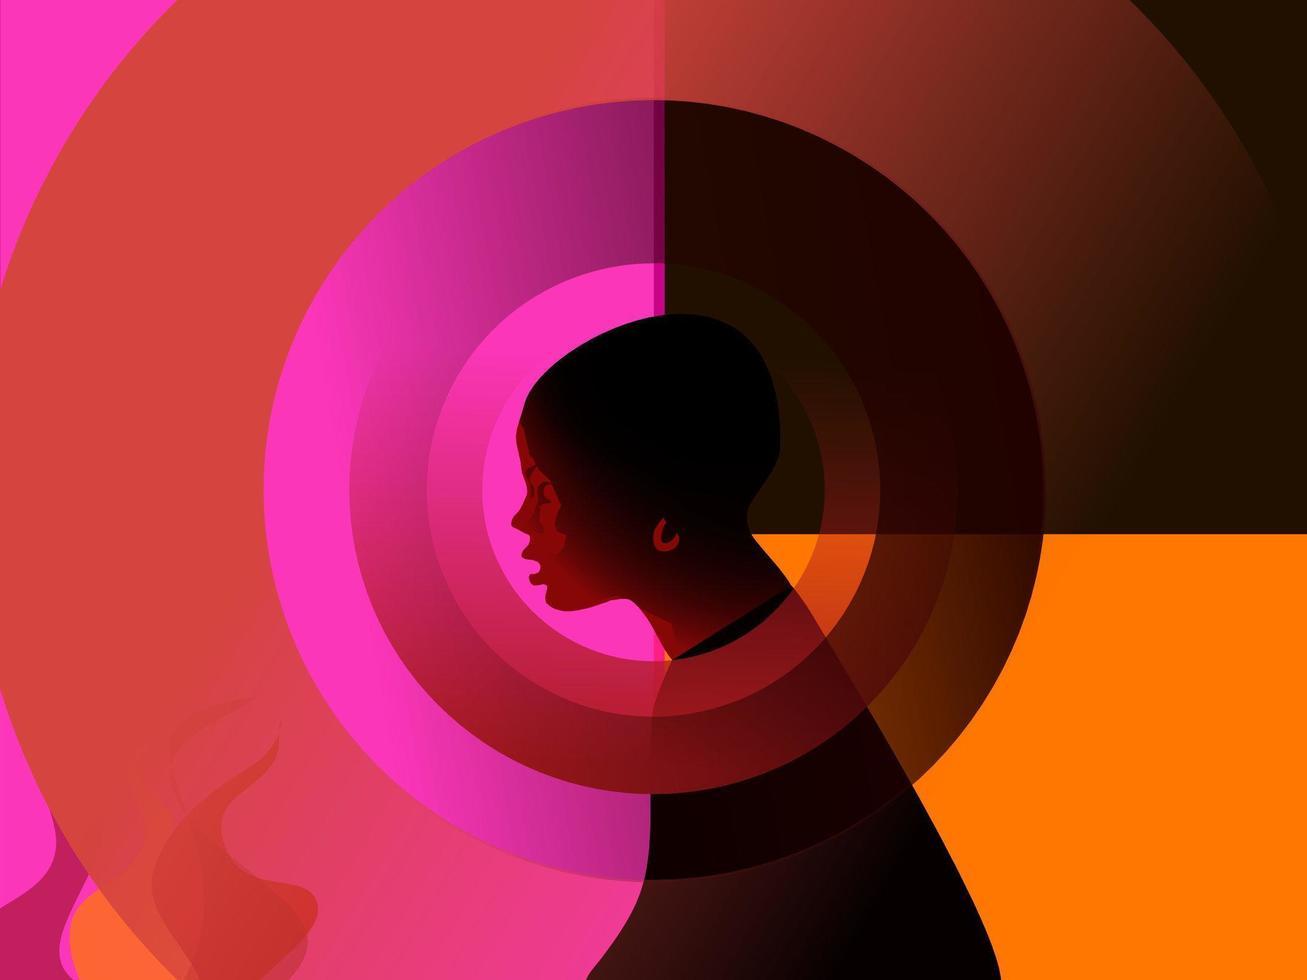 garota americana africana na frente do fogo vetor